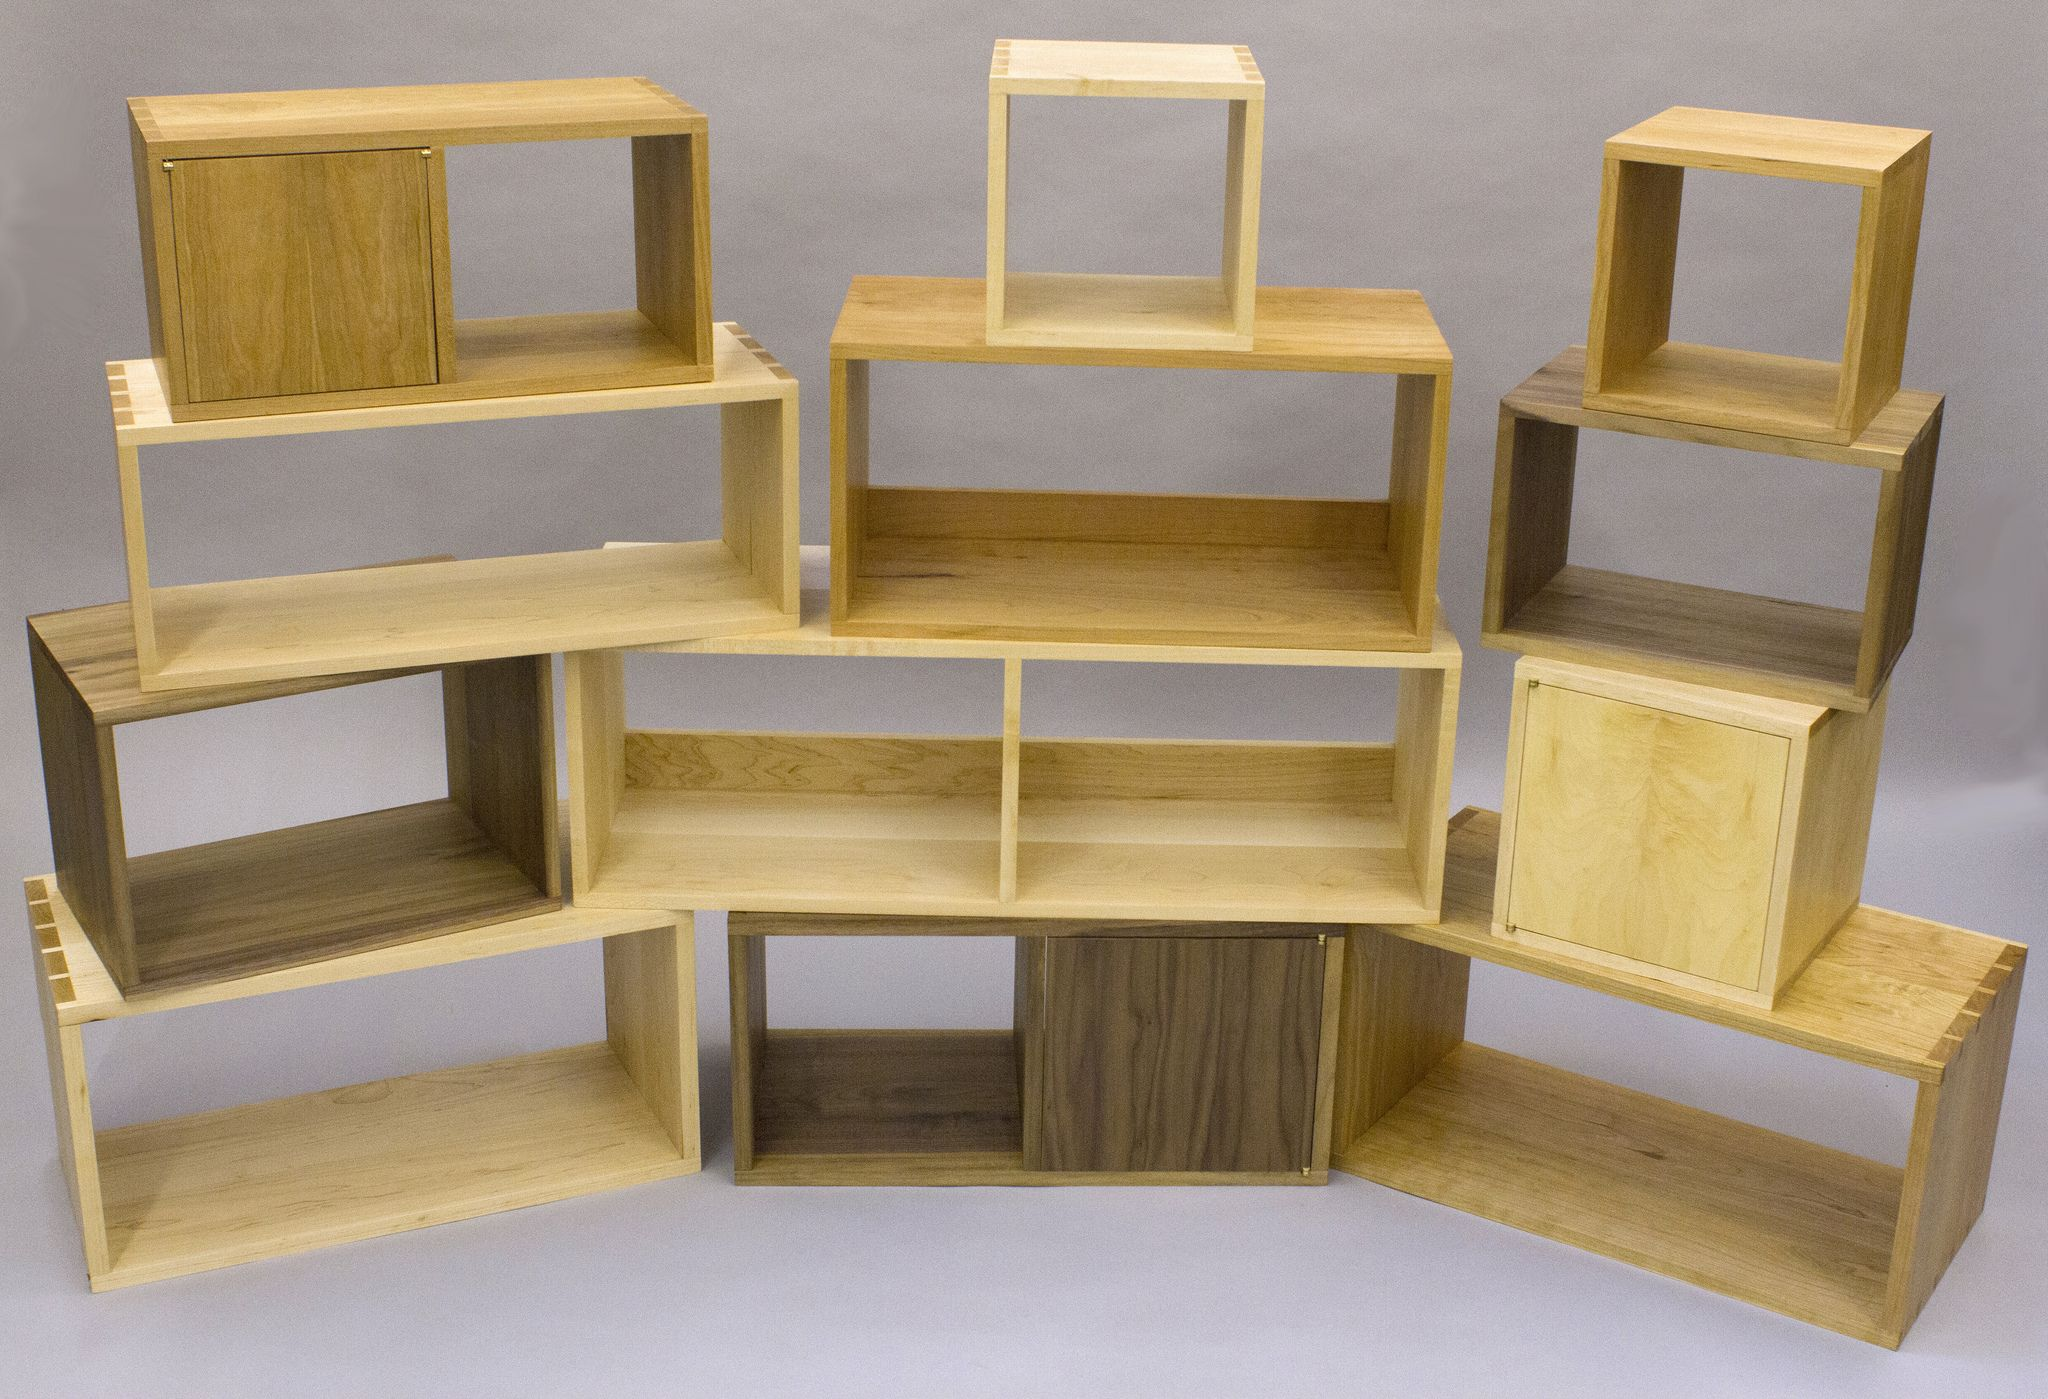 Плюсы мебели из массива березы